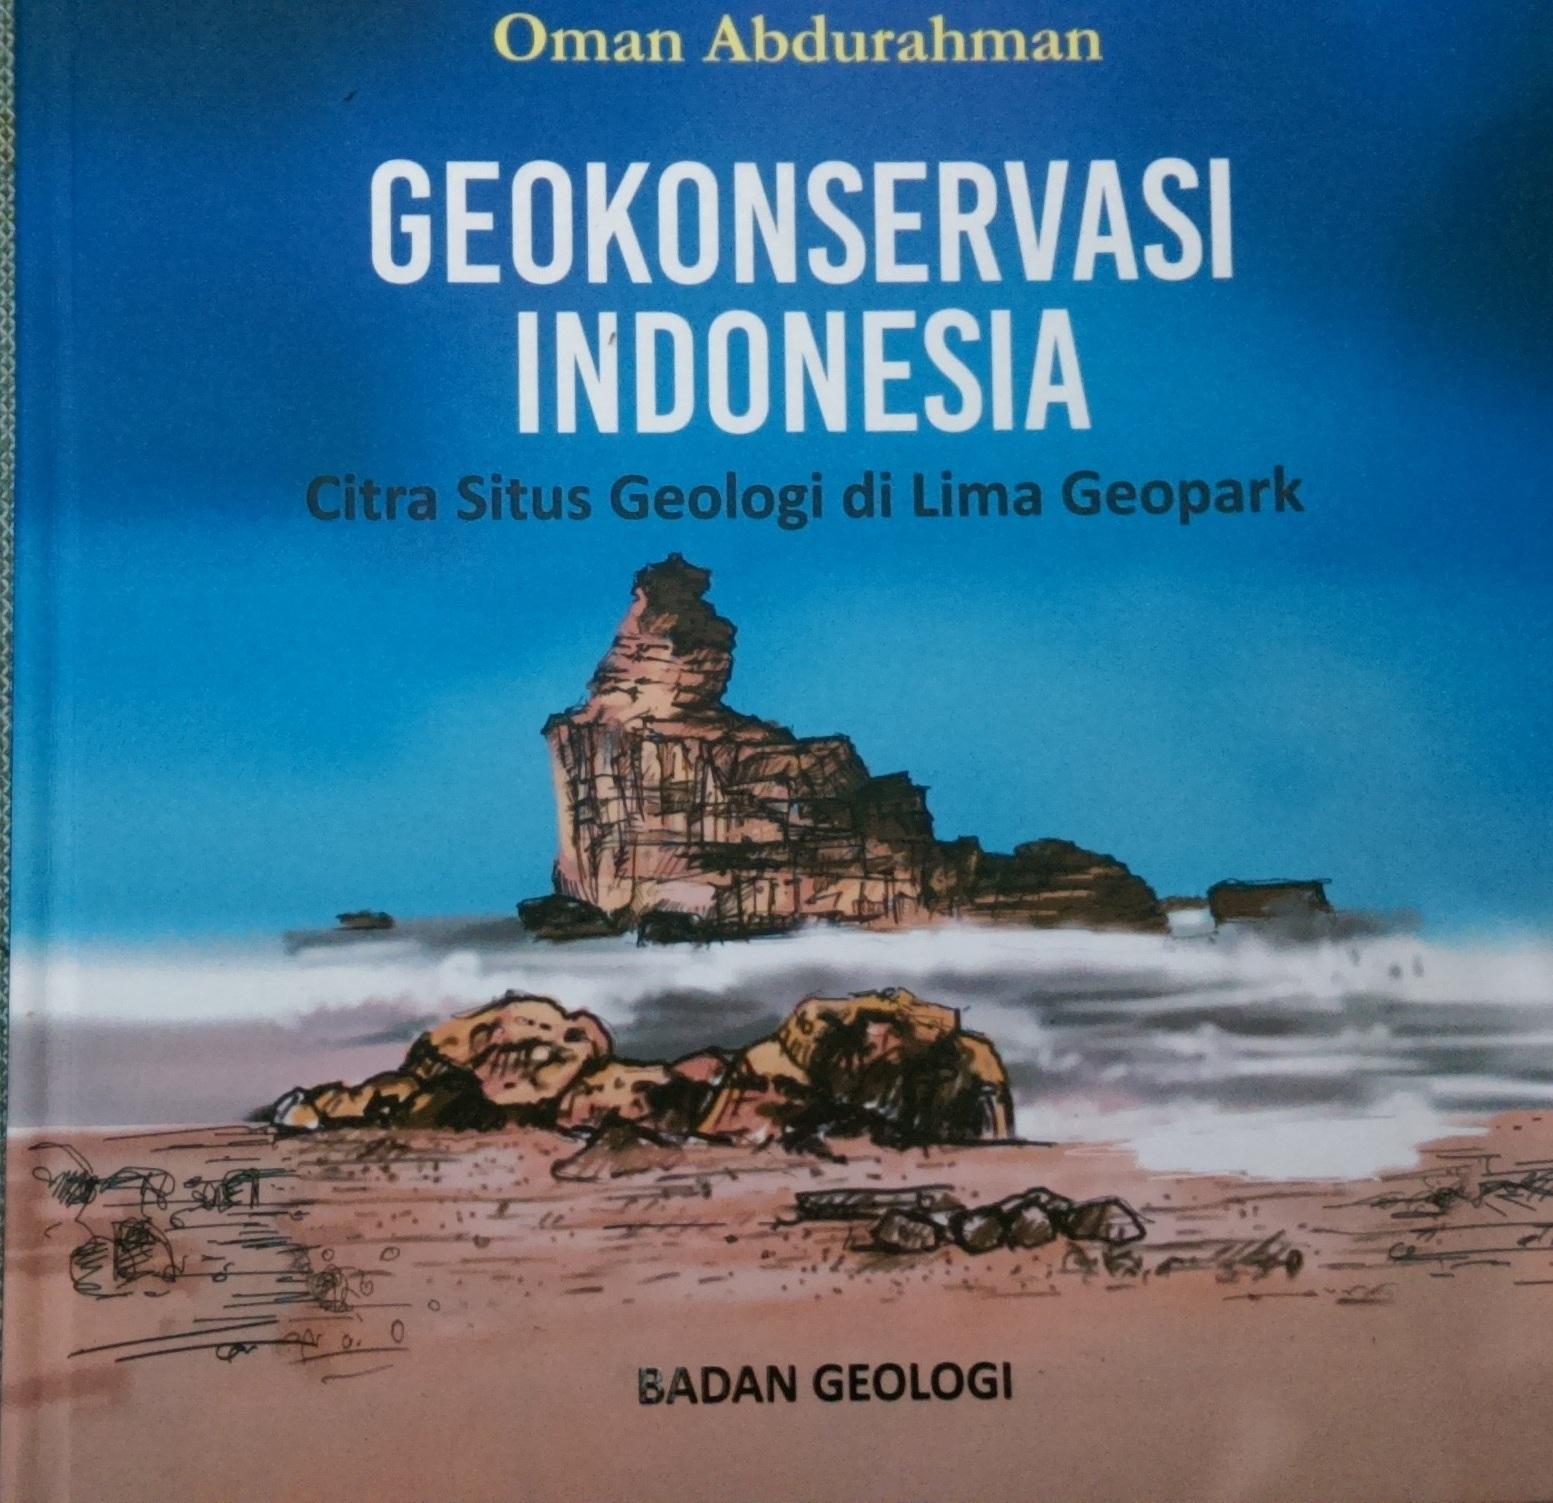 Geokonservasi Indonesia: Citra Situs Geologi di Lima Geopark  by  Oman Abdurahman